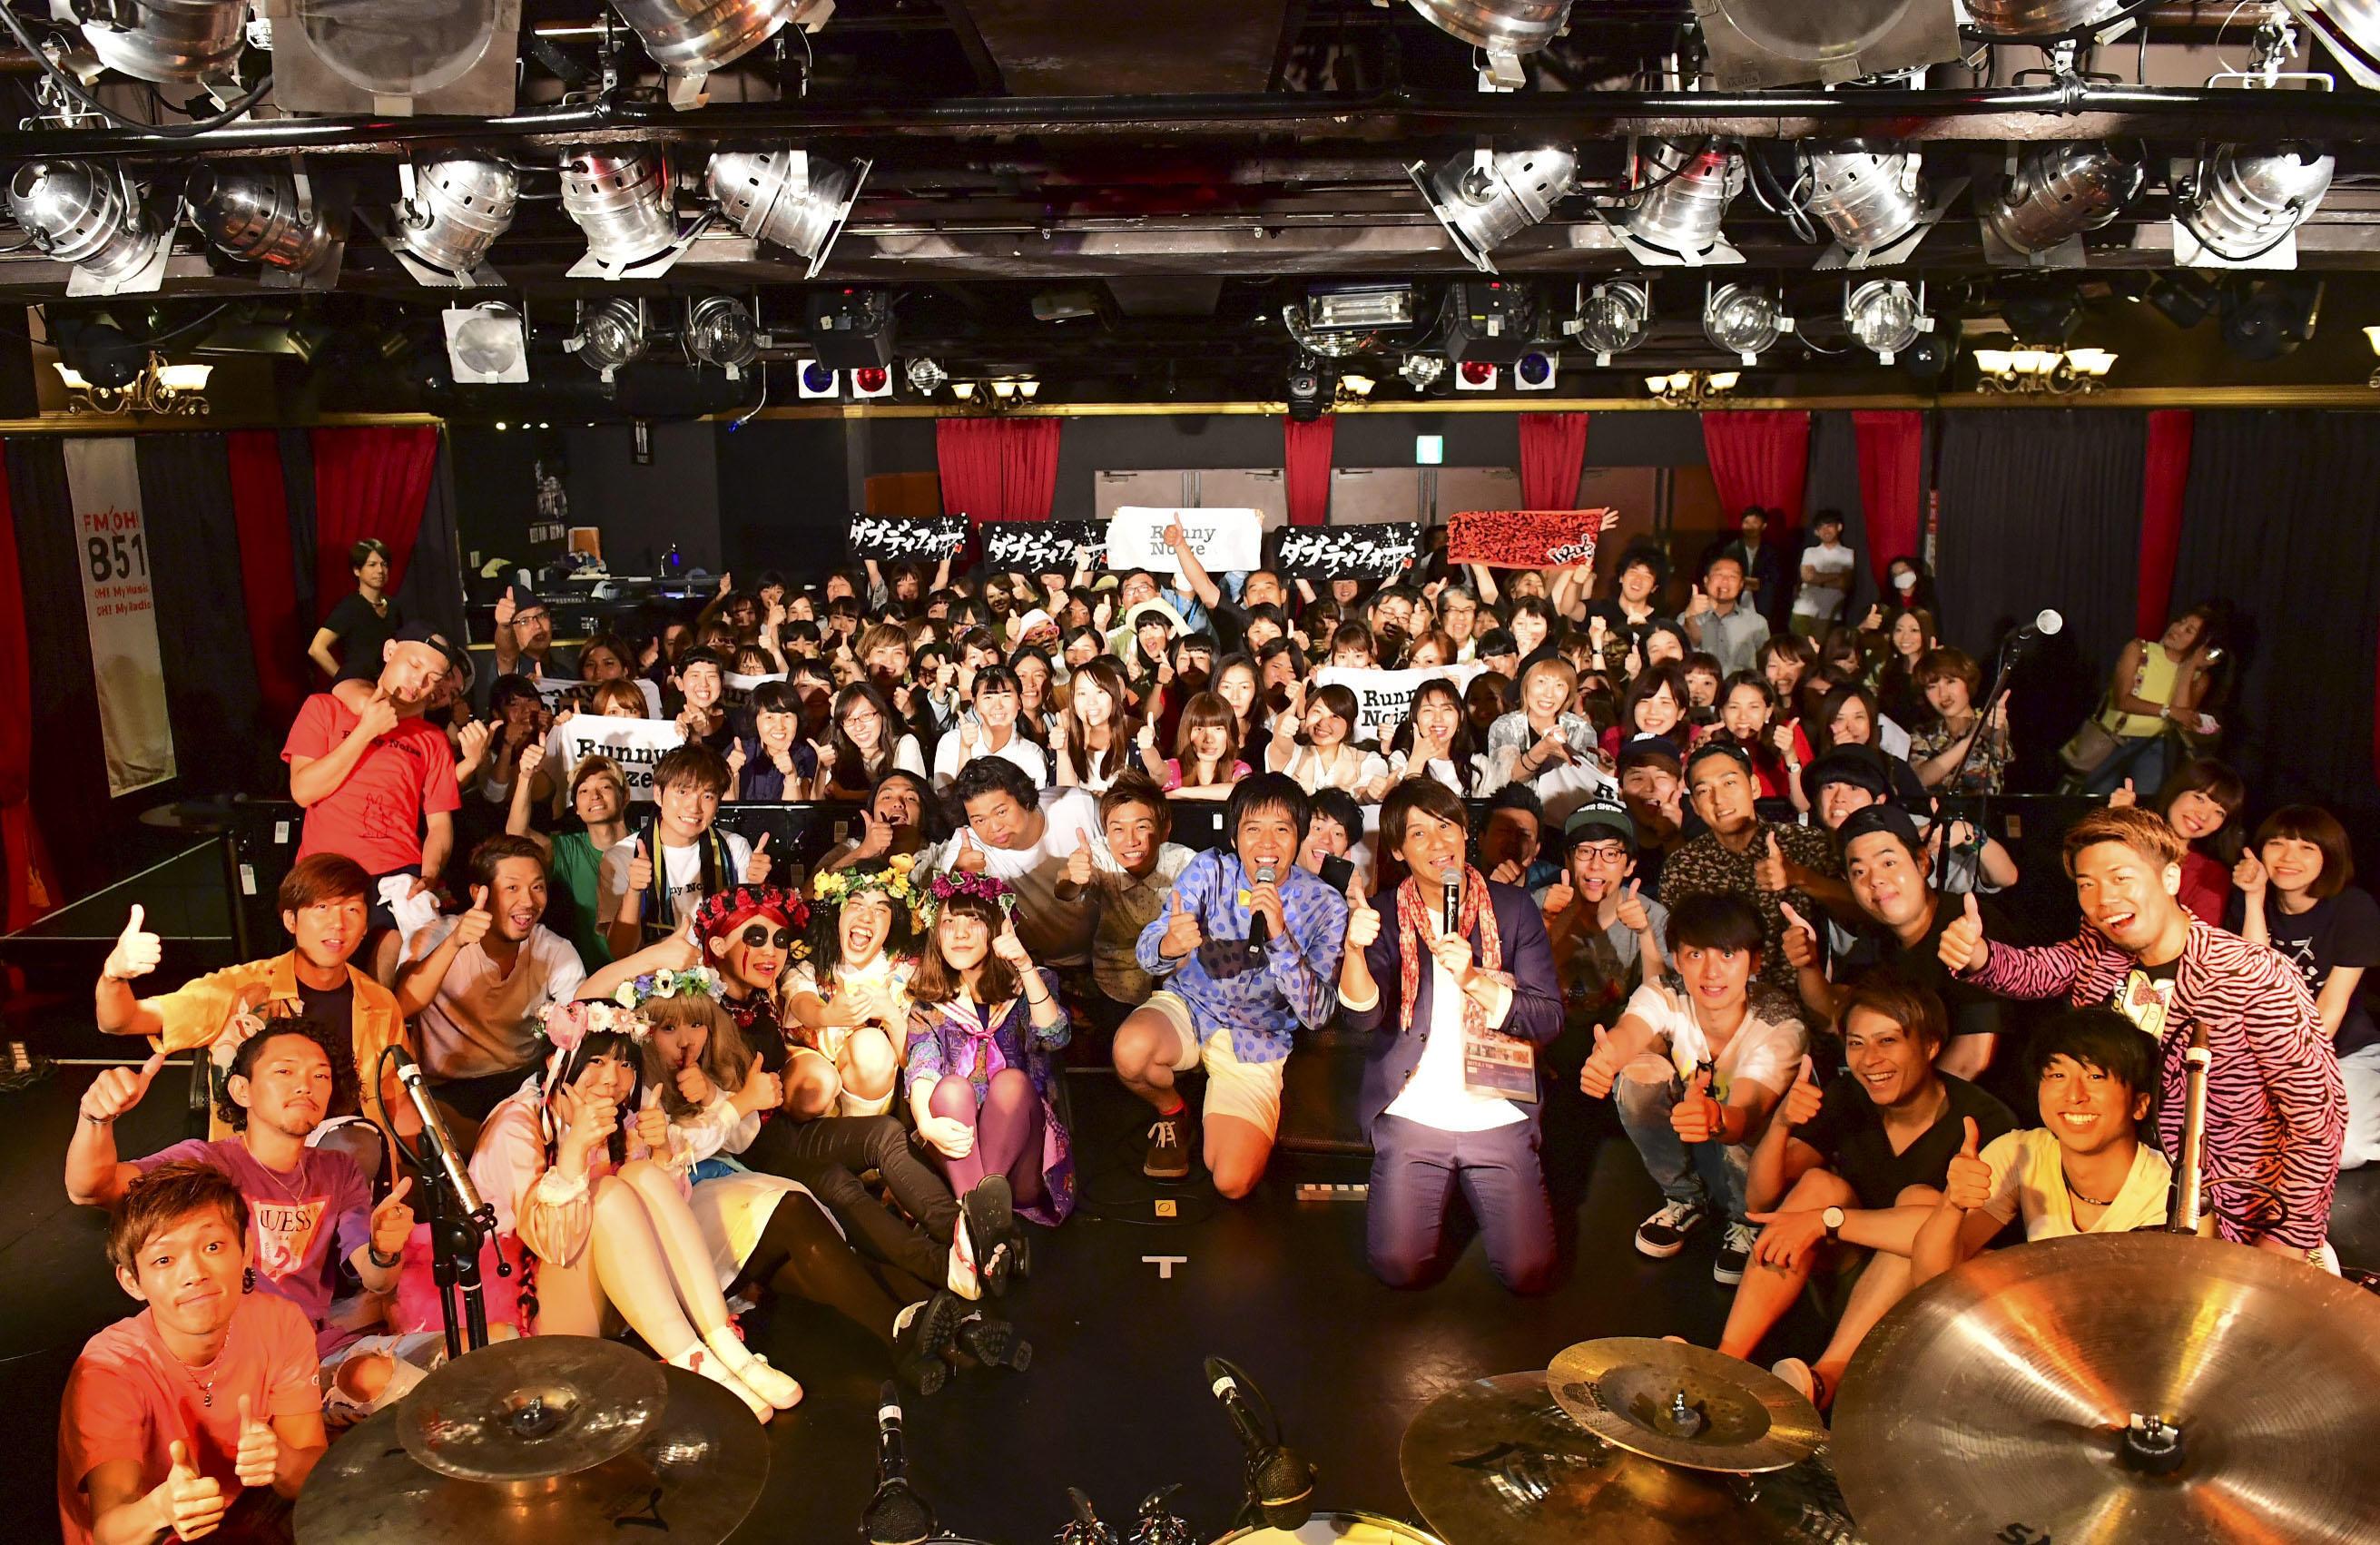 http://news.yoshimoto.co.jp/20170802093349-af2be440cda82161cfa6a160e8457053191b34c9.jpg